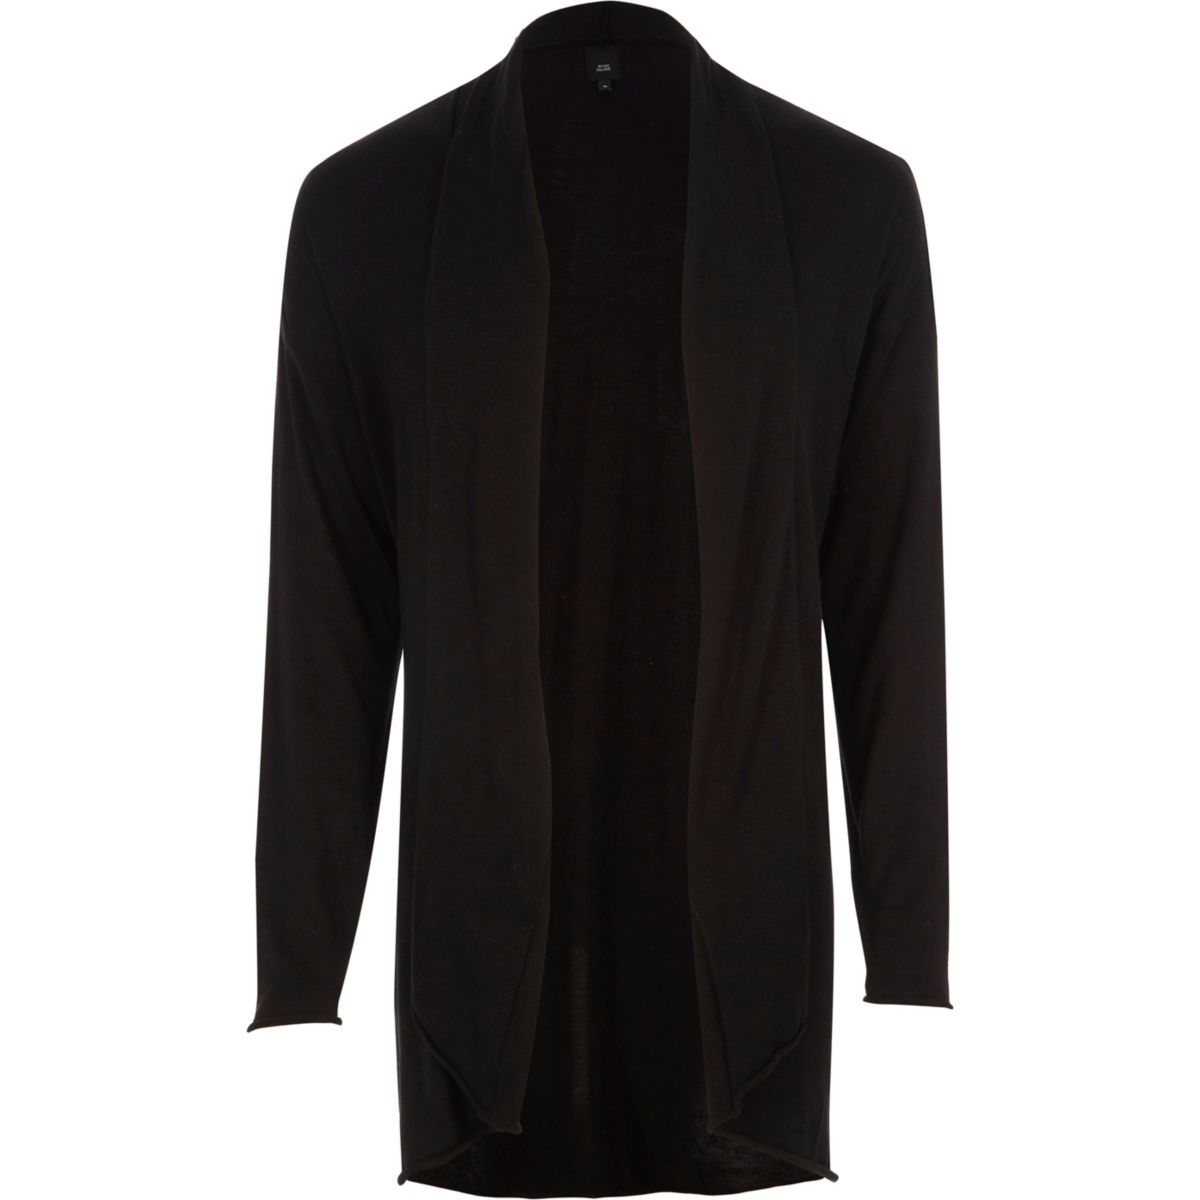 Black longline curved hem cardigan